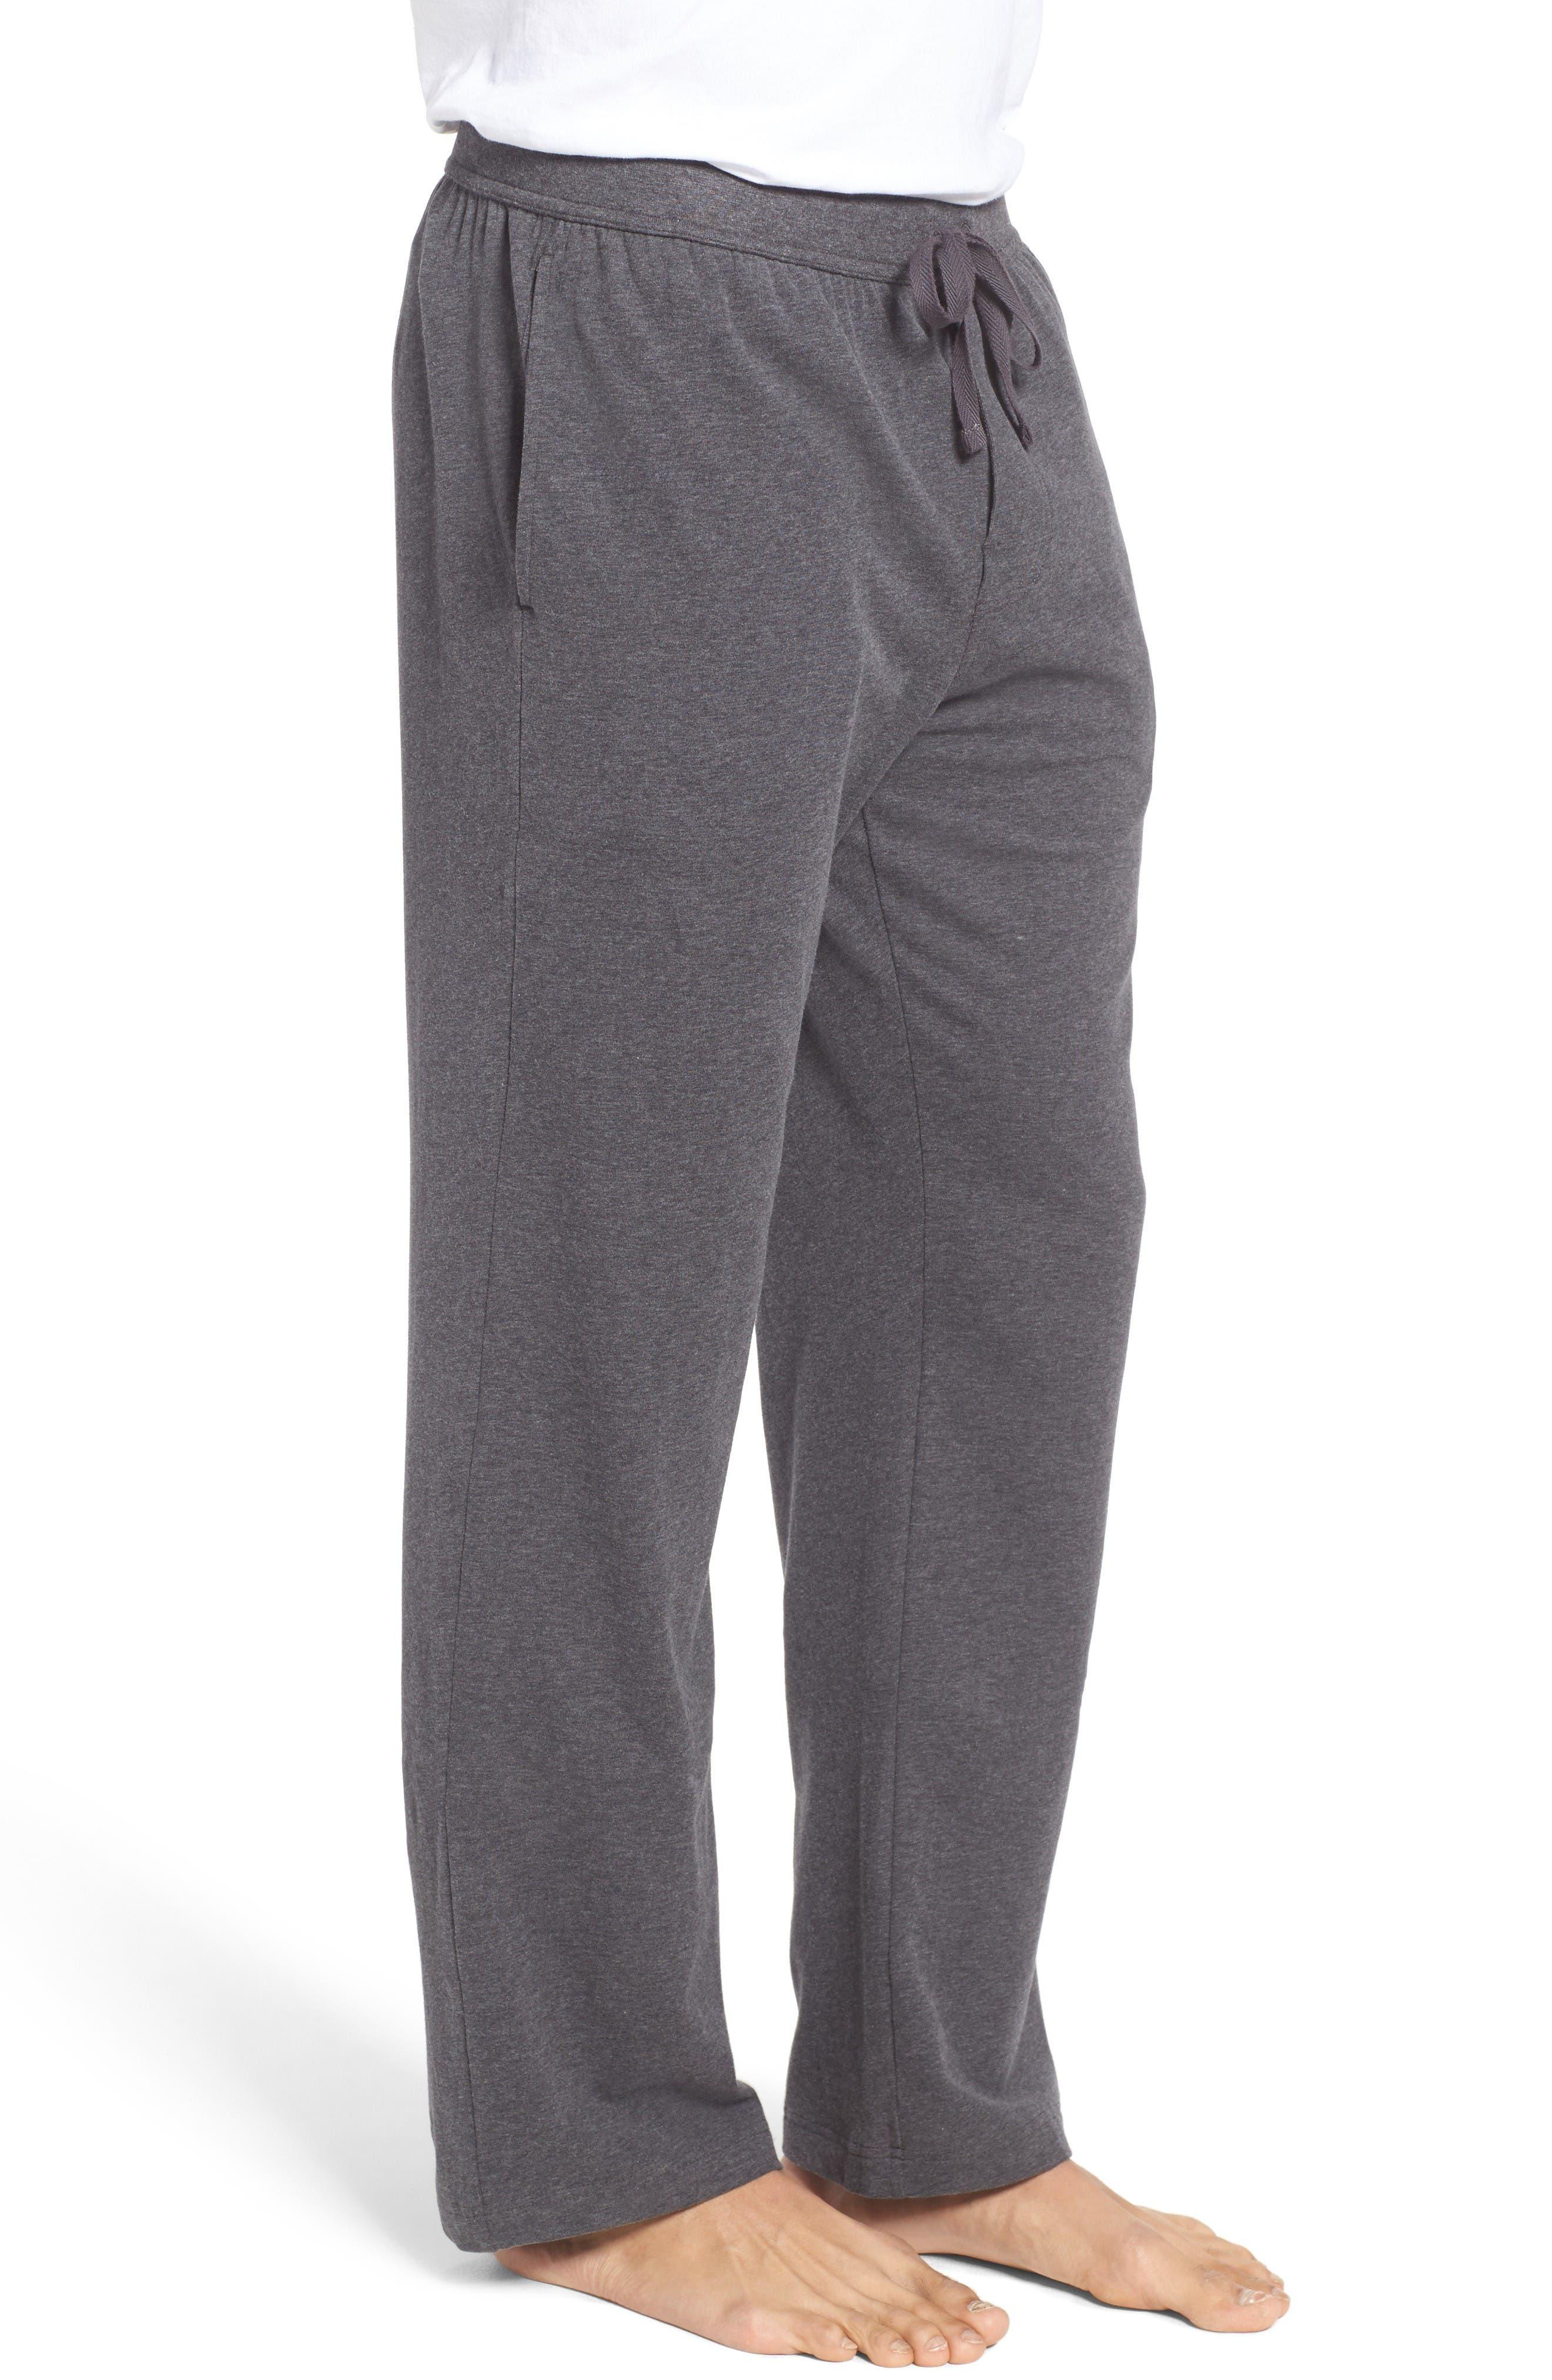 Stretch Cotton Lounge Pants,                             Alternate thumbnail 3, color,                             Grey Charcoal